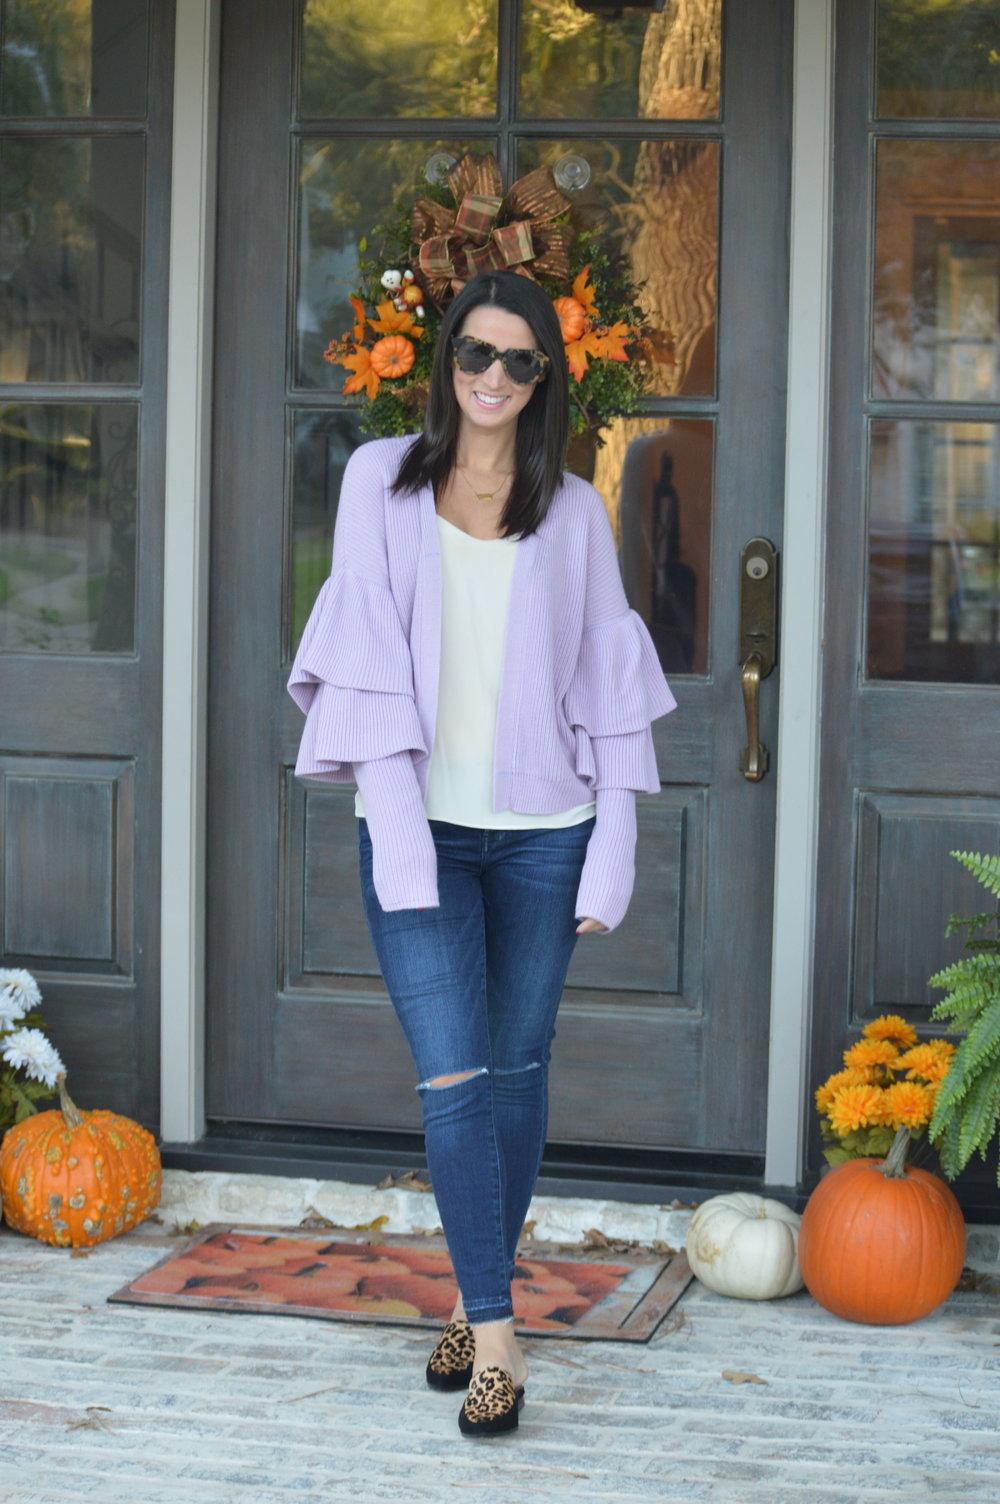 Sweater cardigan  |  Jeans  |  Leopard flats